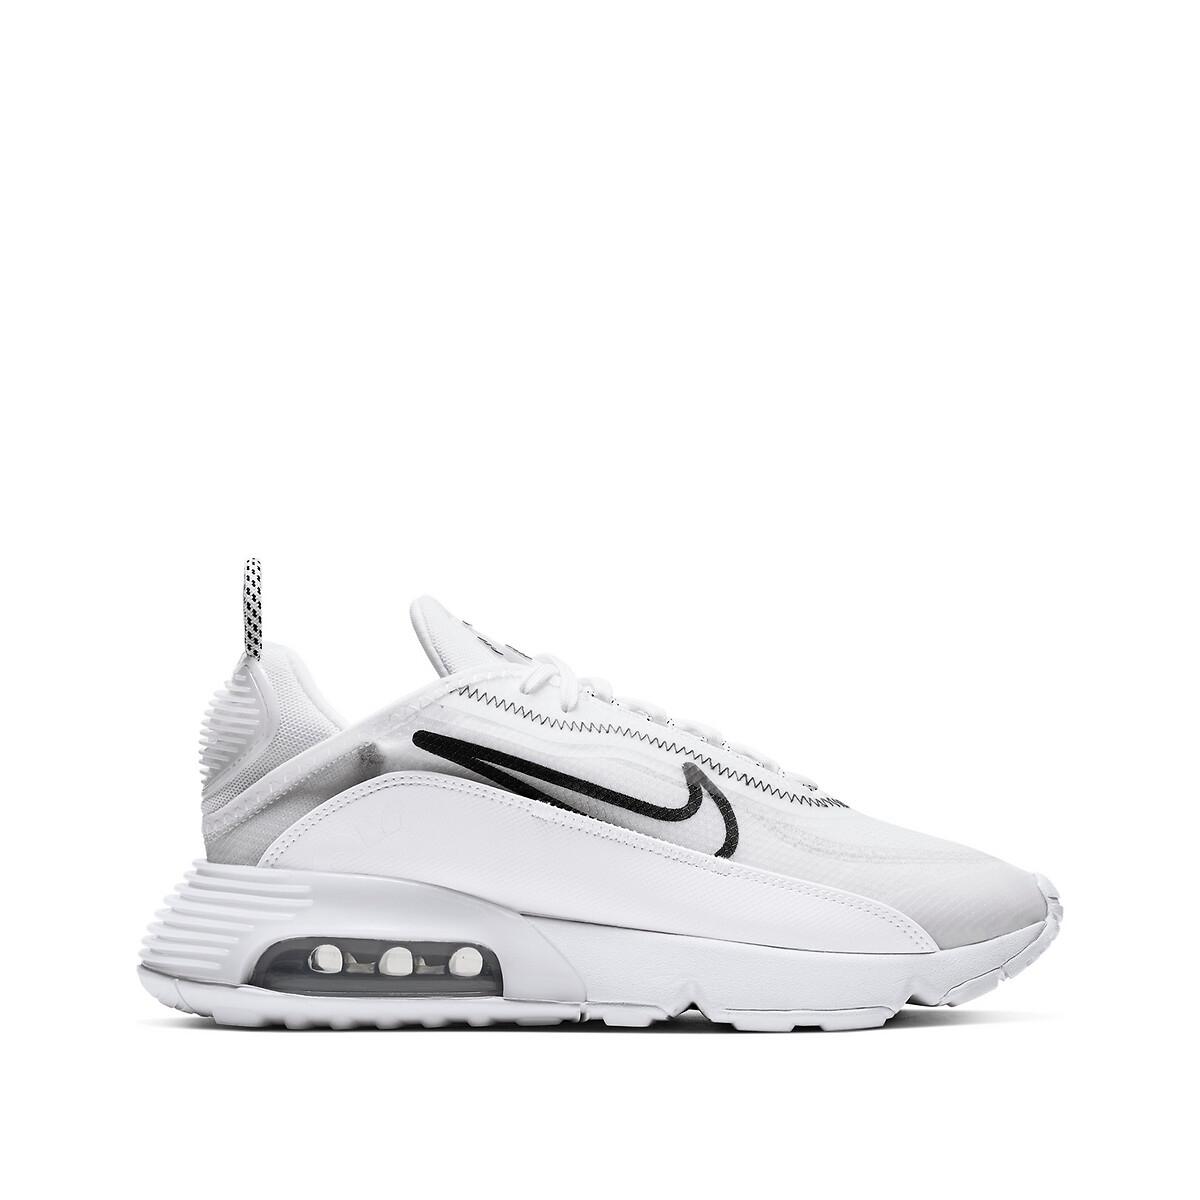 Nike Air Max 2090 Damesschoen White/Black Dames online kopen